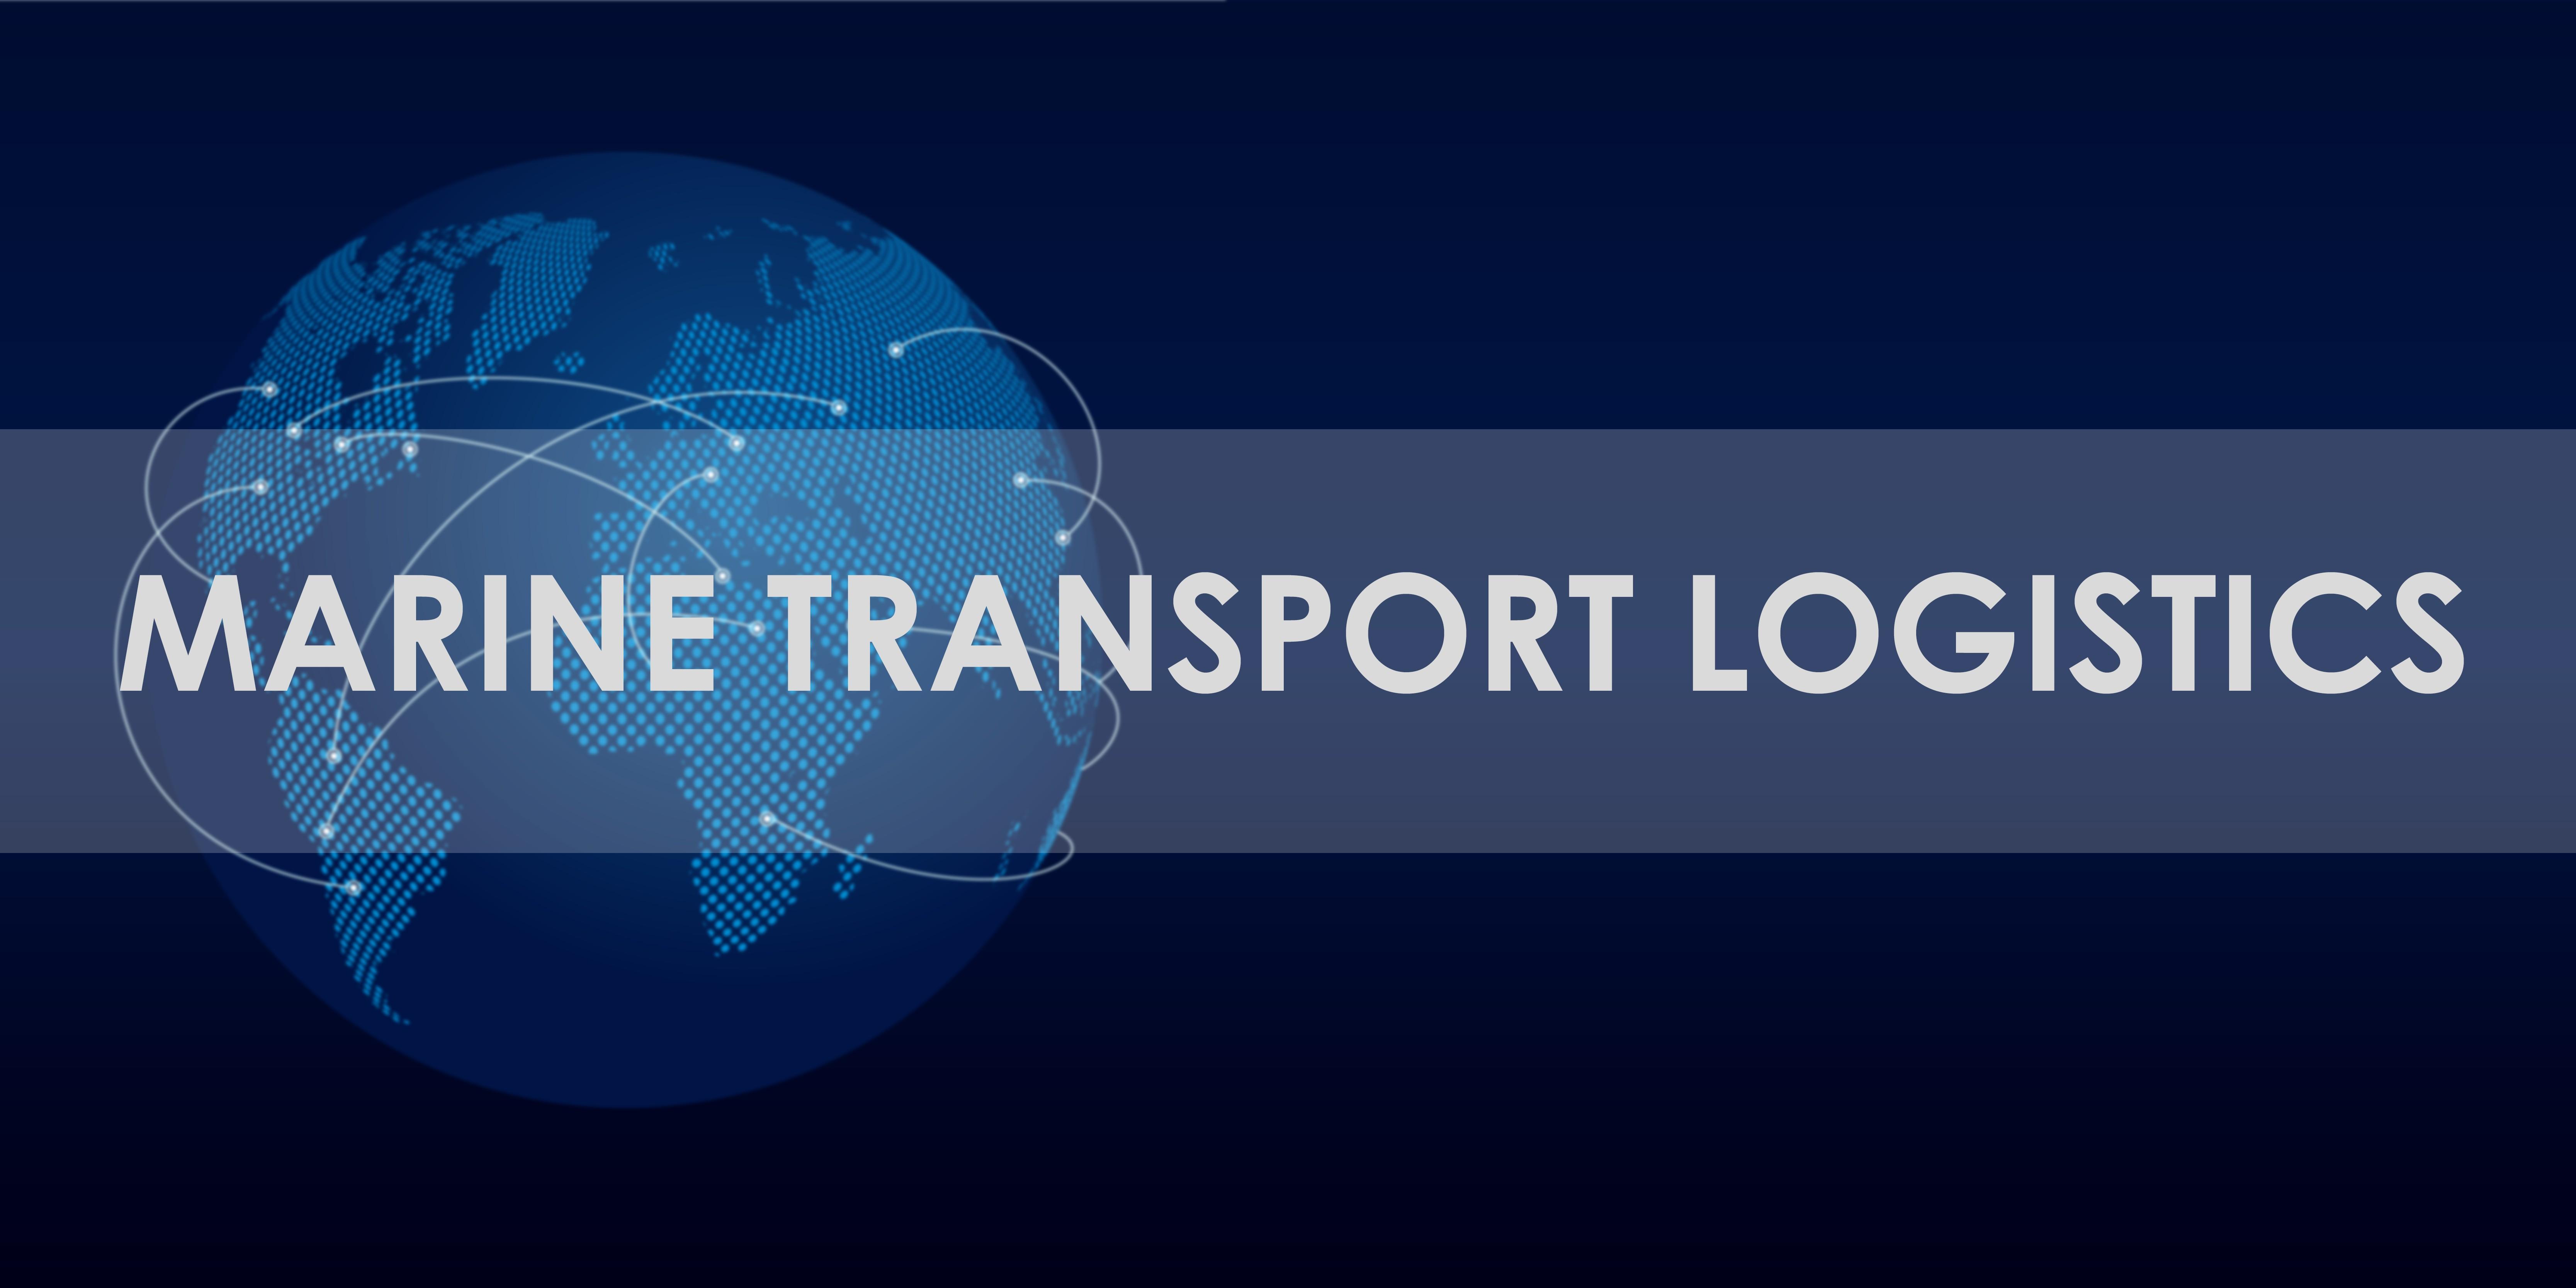 Marine Transport Logistics | LinkedIn